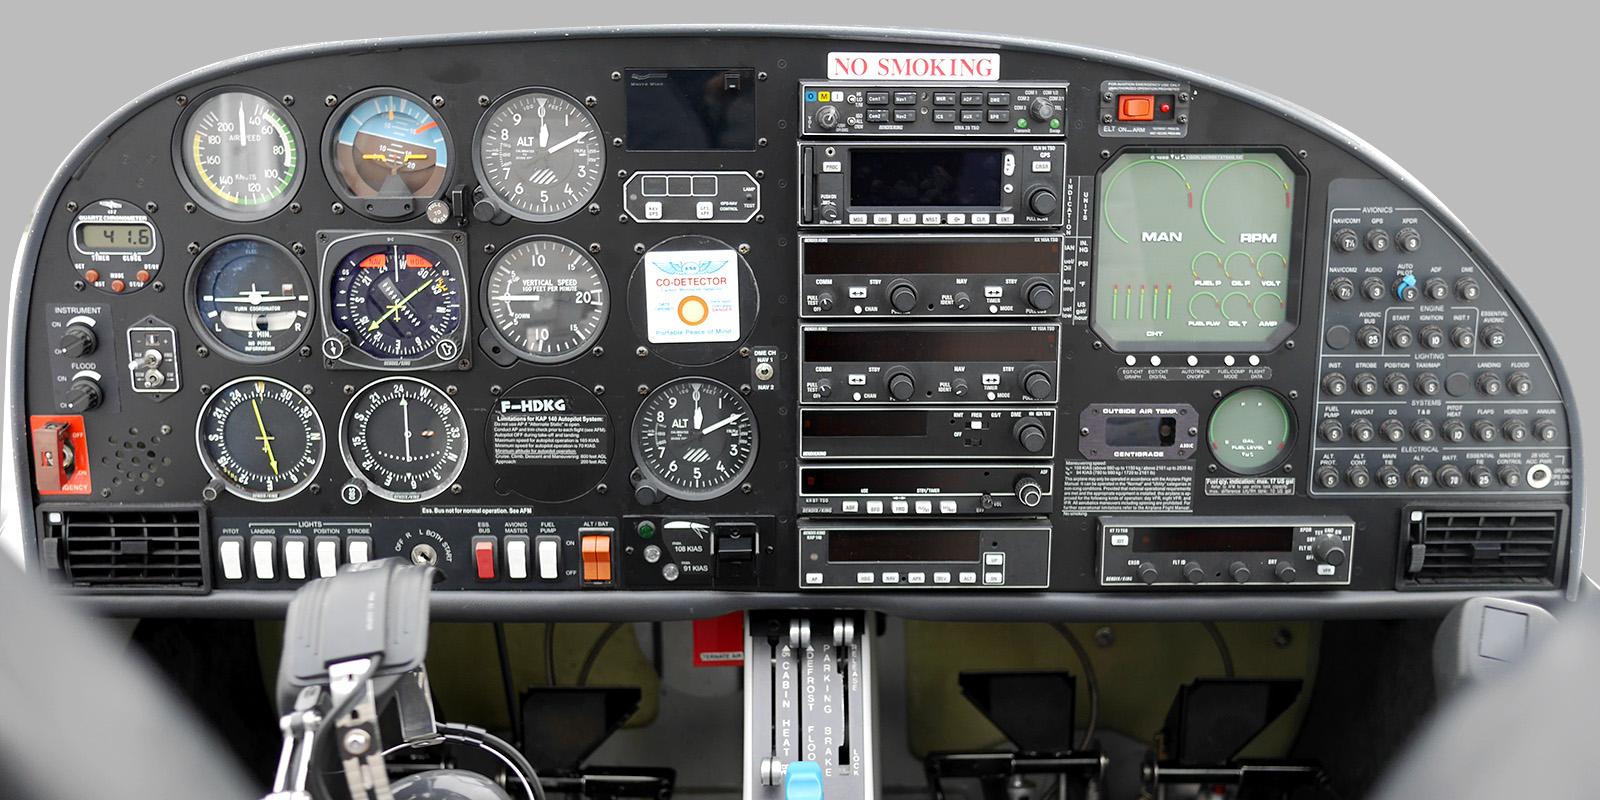 http://aeroclub-angers.fr/wp-content/uploads/2015/01/Cockpit-DA40.jpg